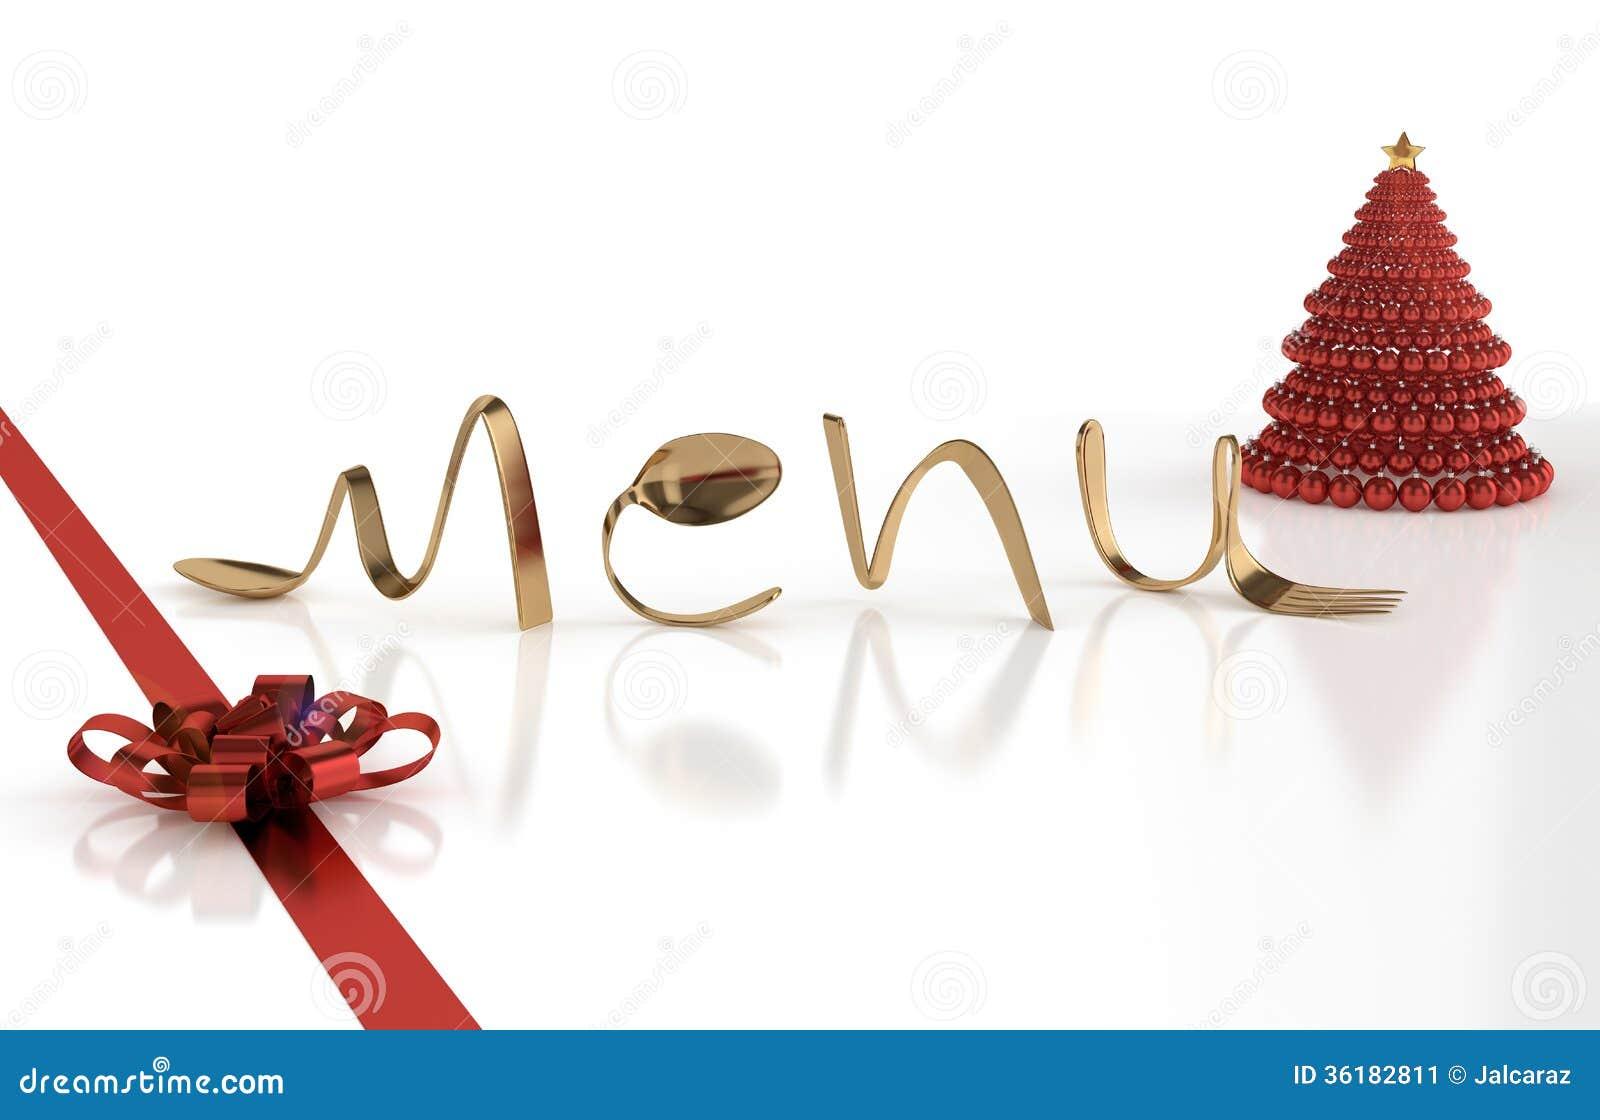 Decoration De Menu De Noel.Christmas Menu Stock Illustration Illustration Of